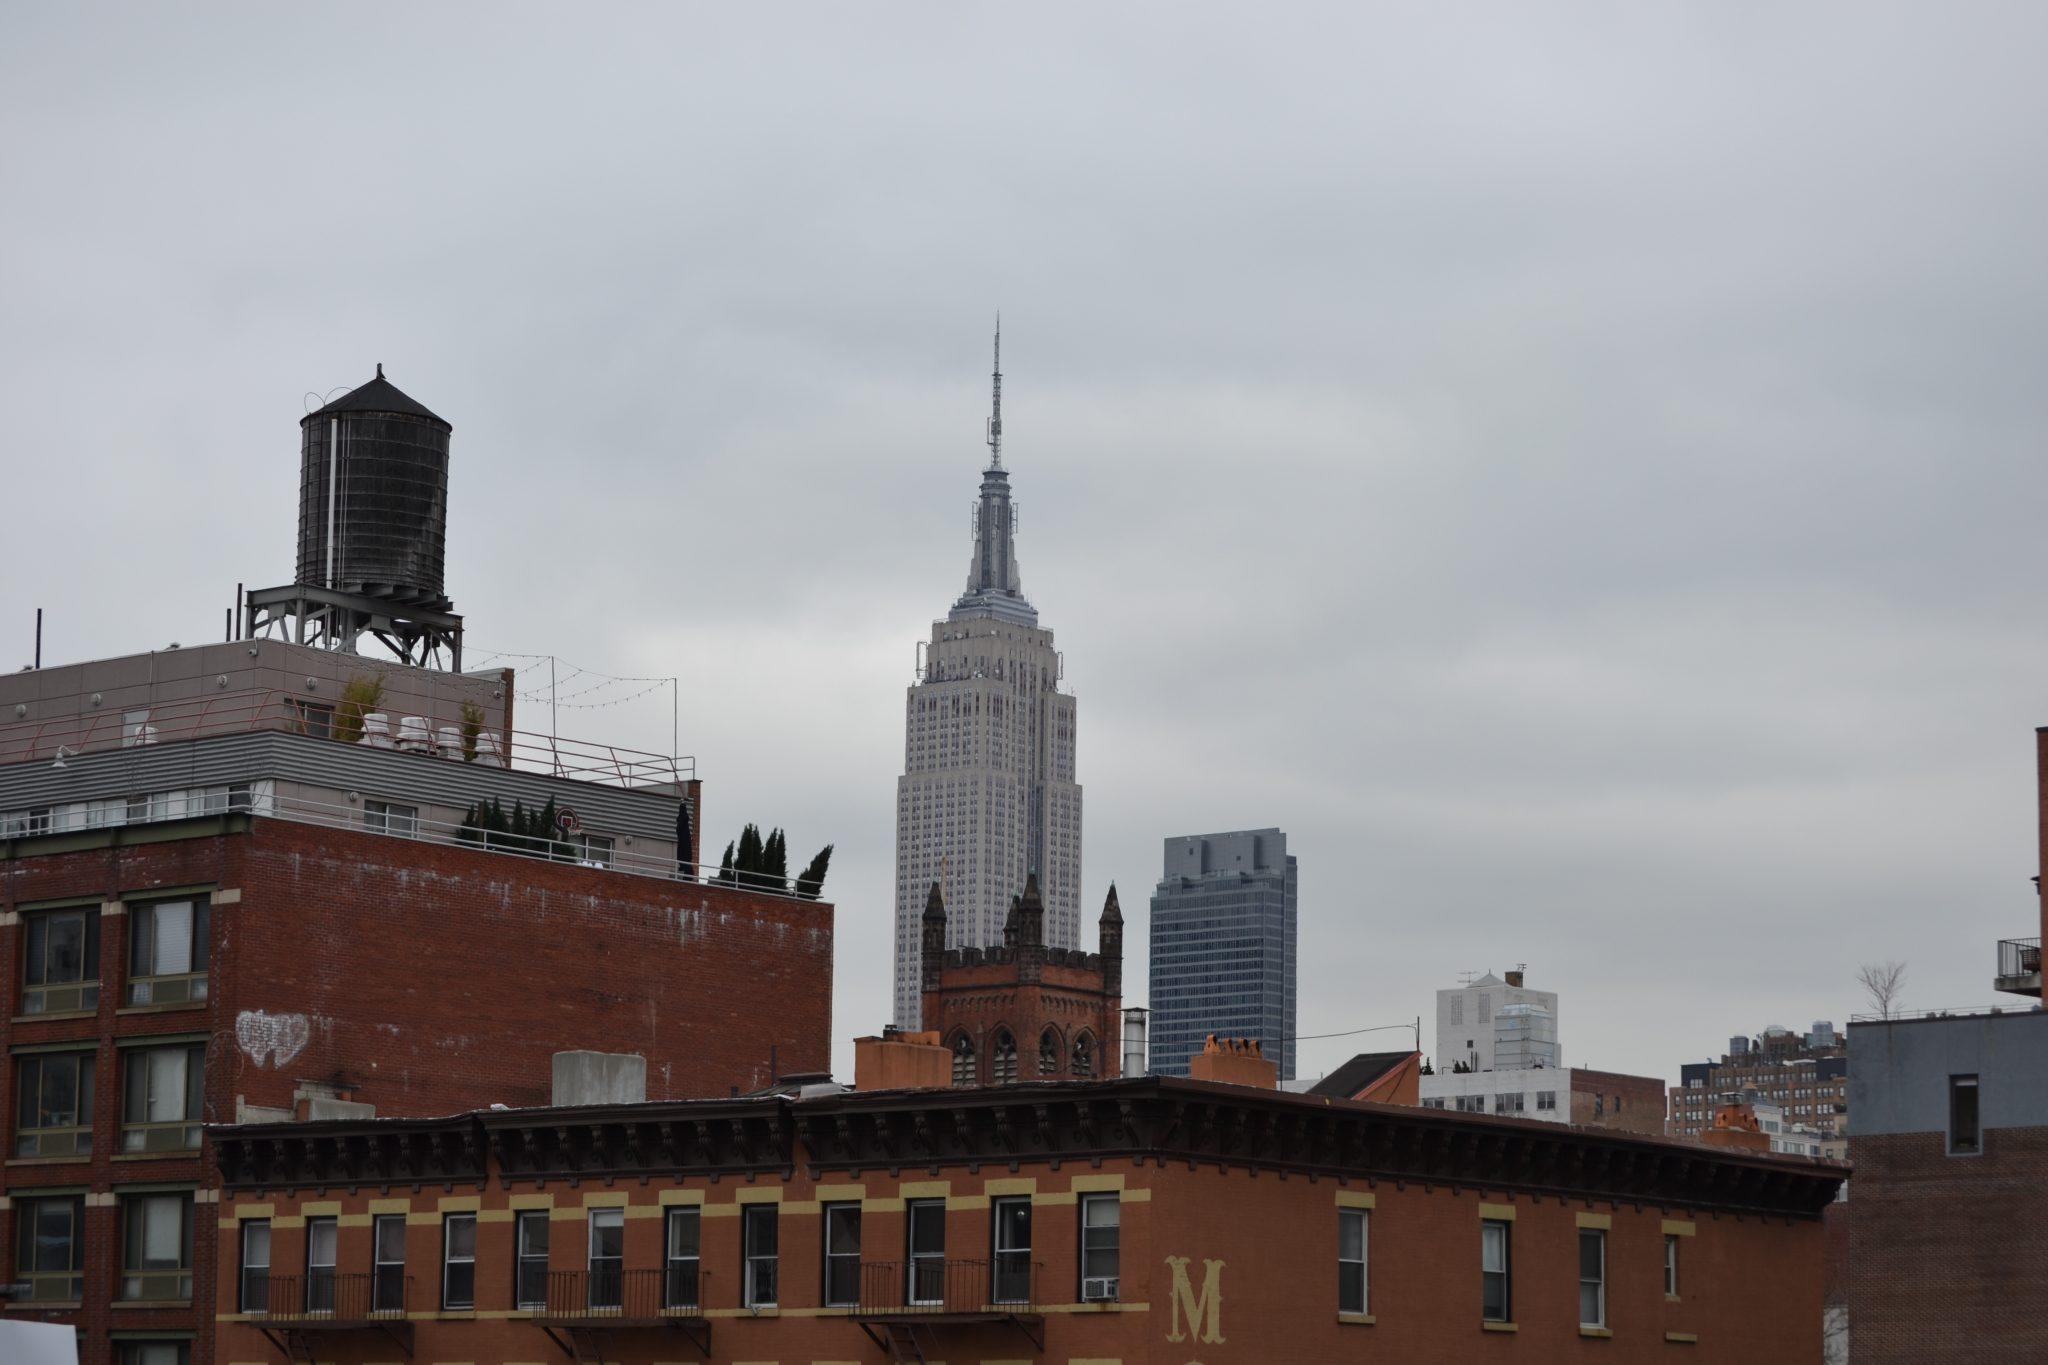 Eine Woche in New York: Washington Square Park & Madison Square Park - dsc 0324